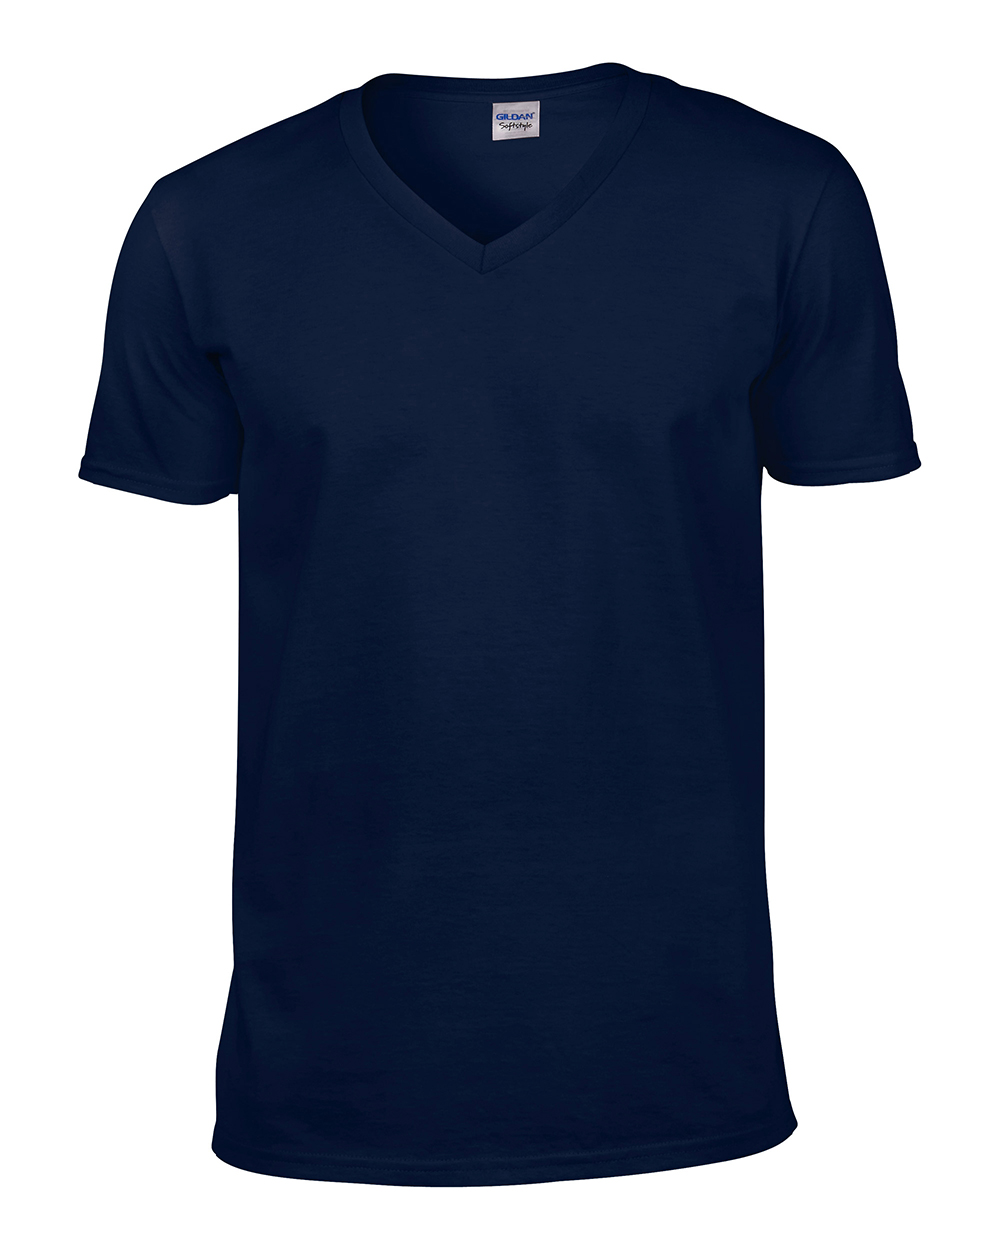 Gildan Softstyle Men 39 S V Neck Cotton T Shirt Short Sleeve